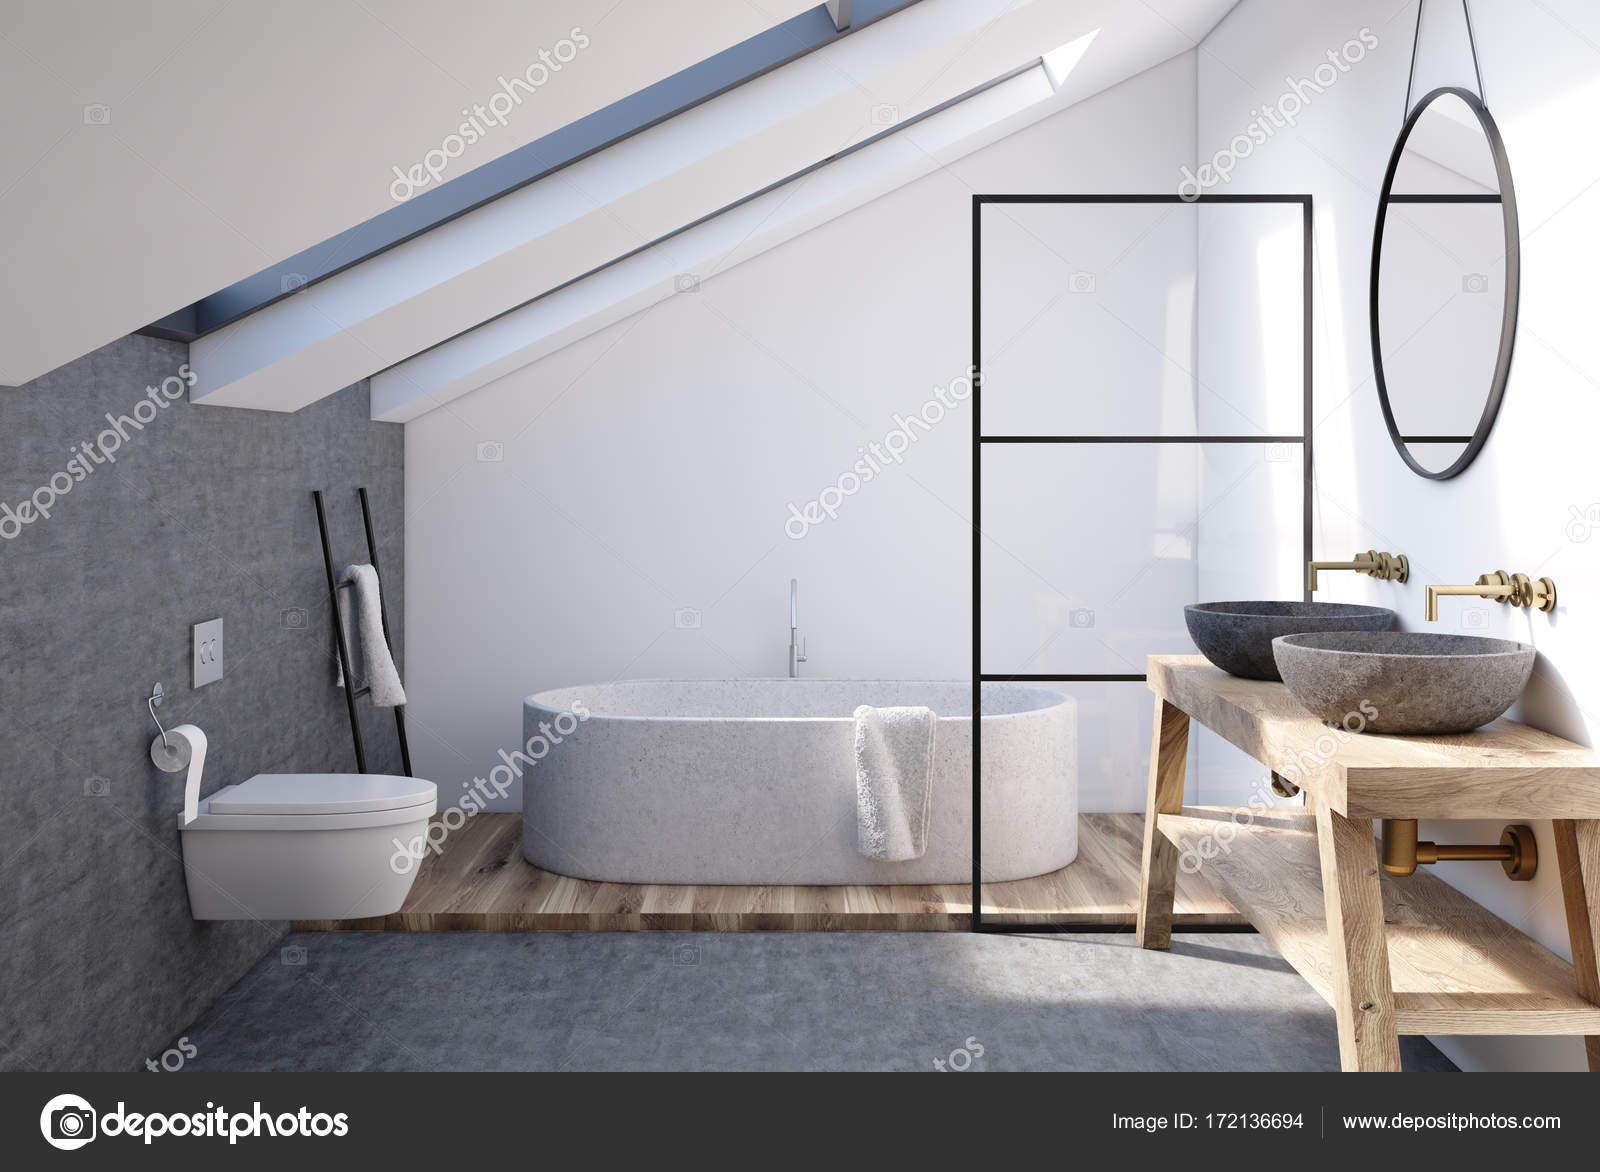 Pareti del bagno mansarda grigio u foto stock denisismagilov